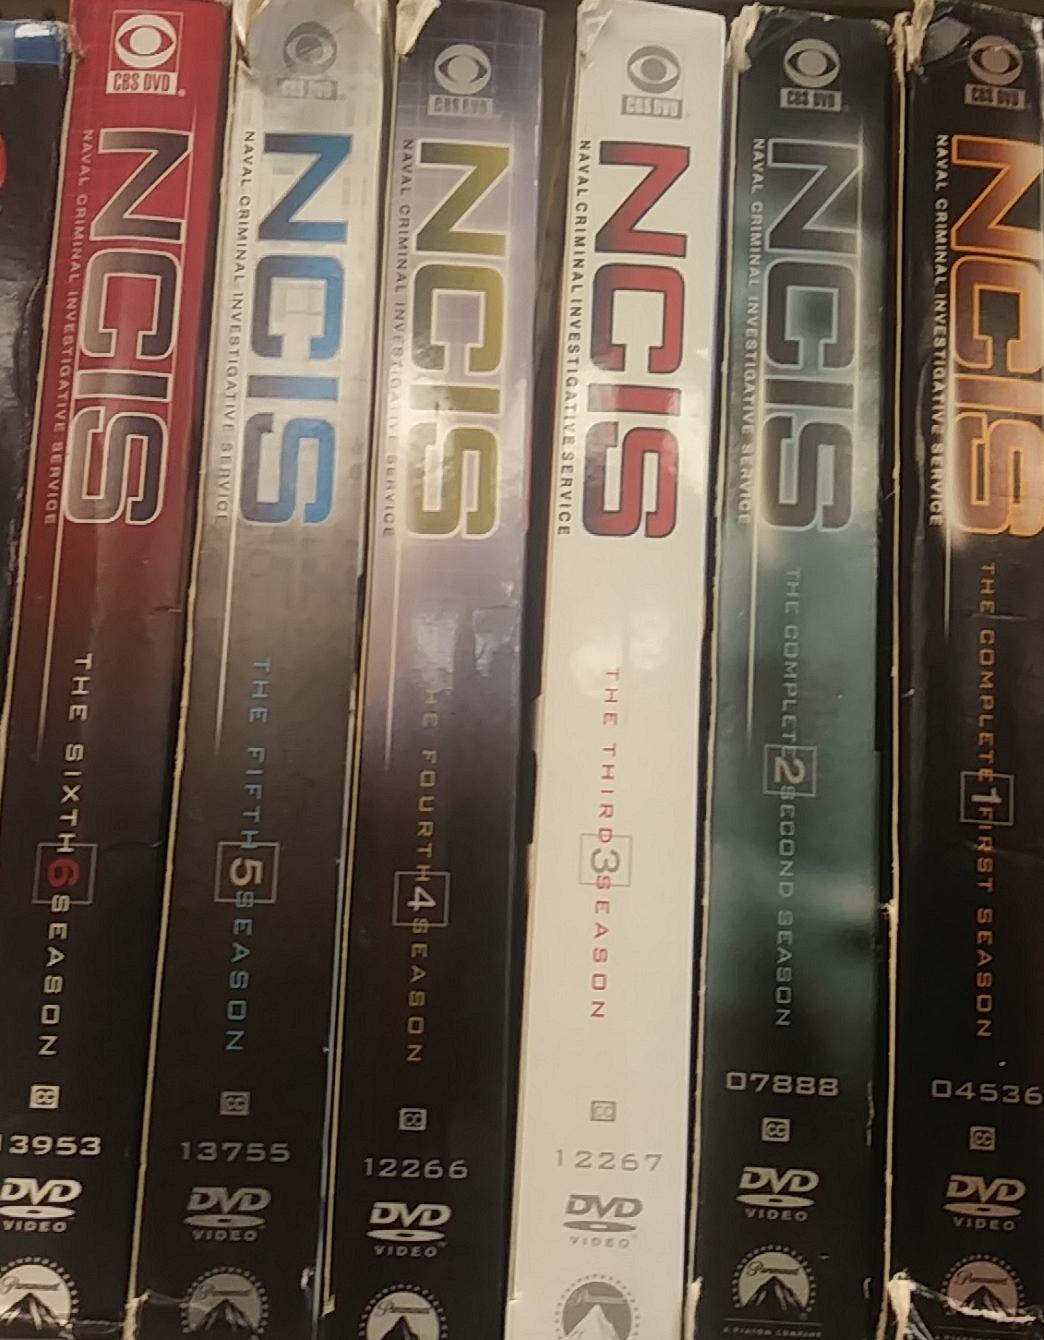 NCIS SEASONS: 1-6